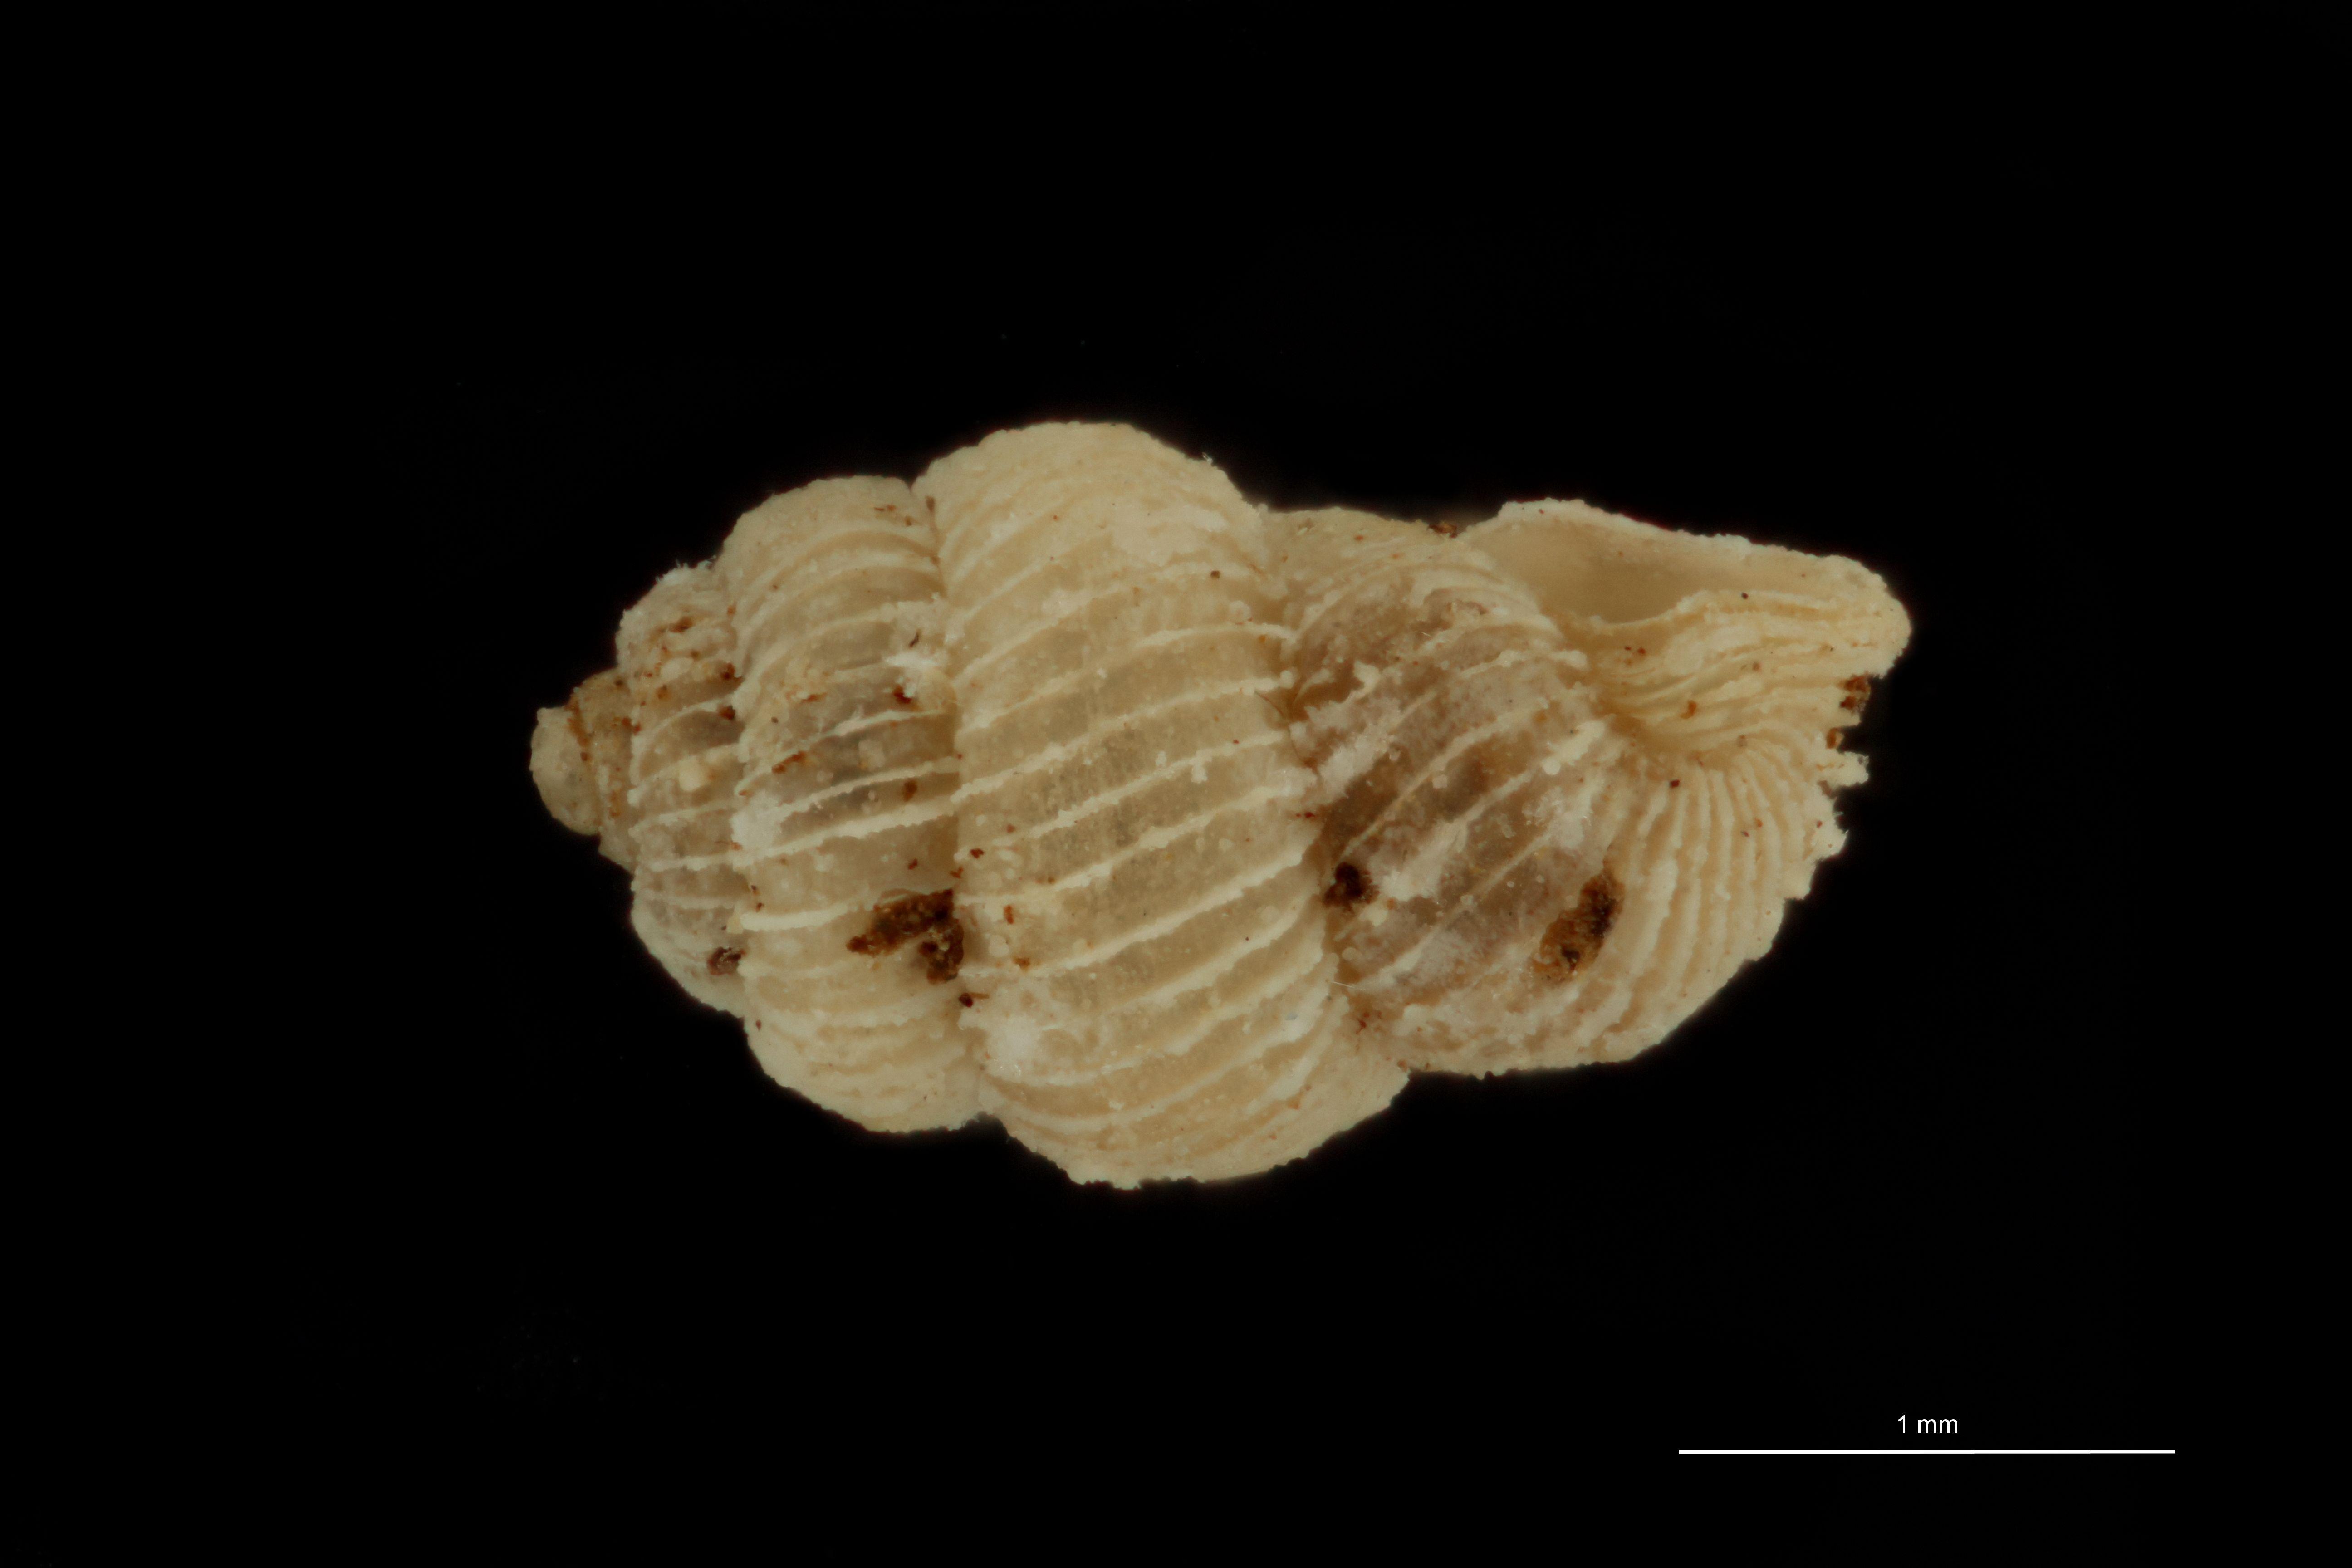 BE-RBINS-INV MT 1019 Arinia (Leucarinia) palainaeformis pt L.jpg